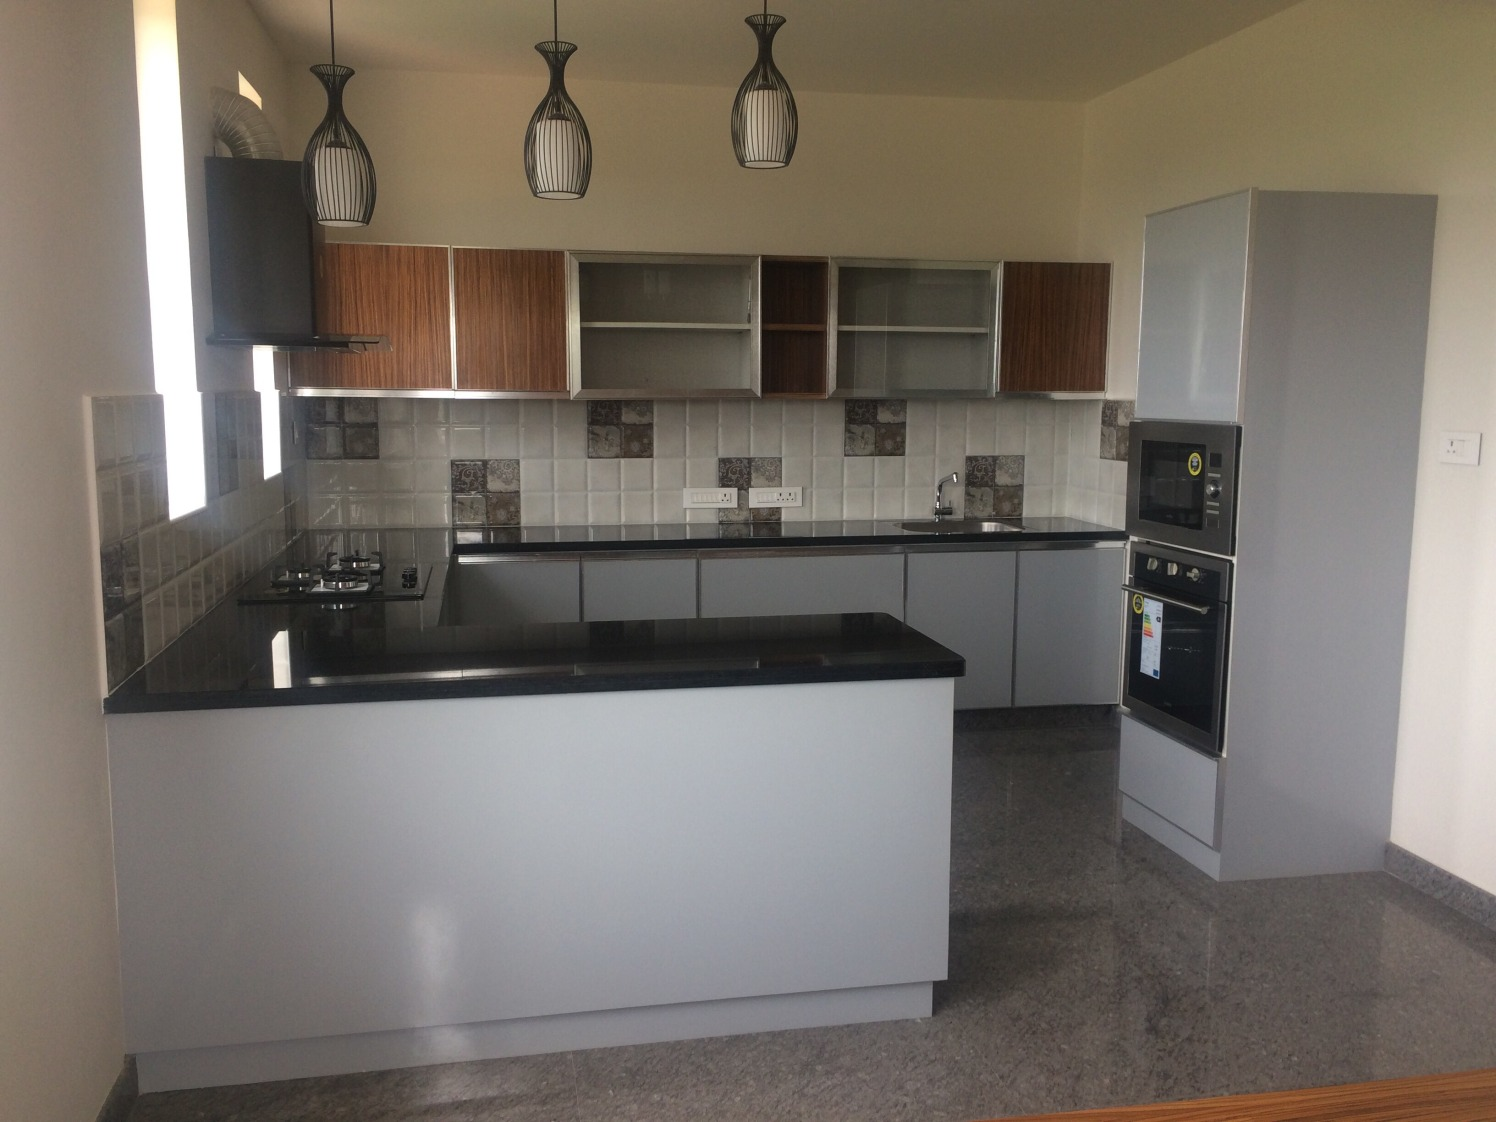 U Shaped White Modular Kitchen Cabinets by JPS Interiors